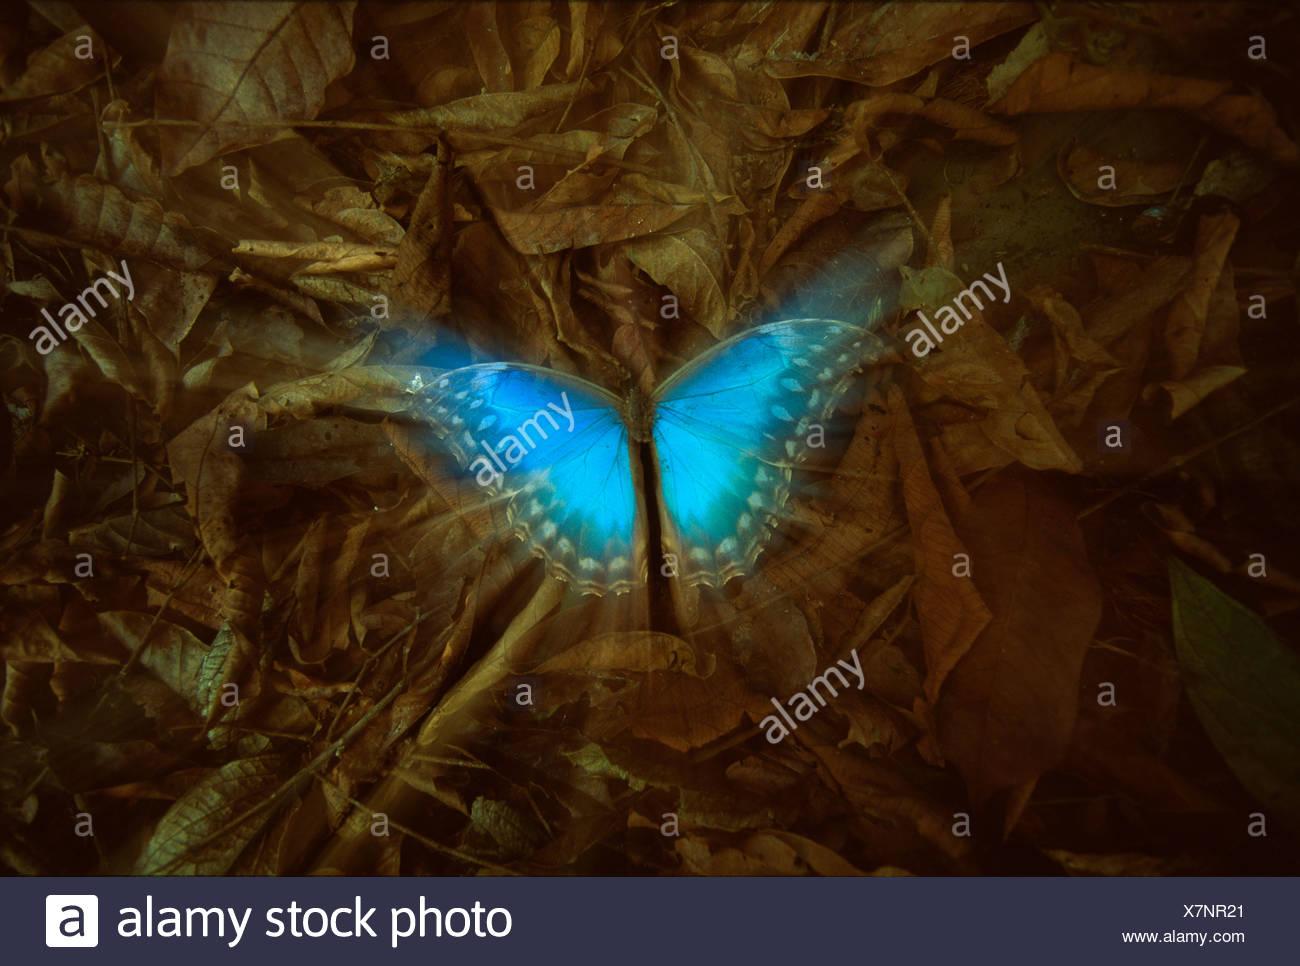 Ein toter Schmetterling Blue Morpho liegt Amonst das braune auf Waldboden, Corcovado Nationalpark, Costa Rica (Morpho Peleides Blätter) Stockbild